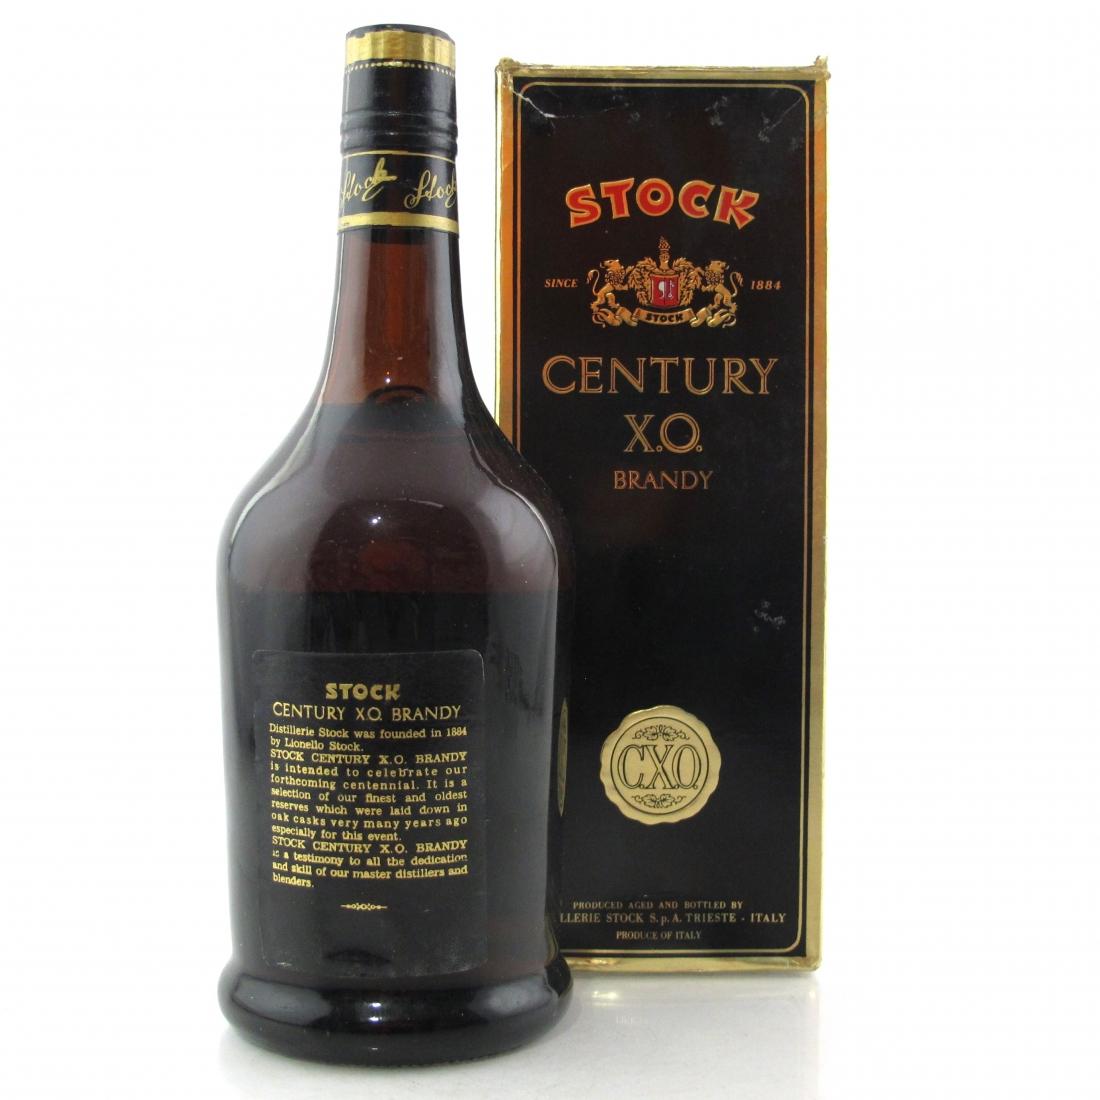 Stock Century XO Brandy 1980s